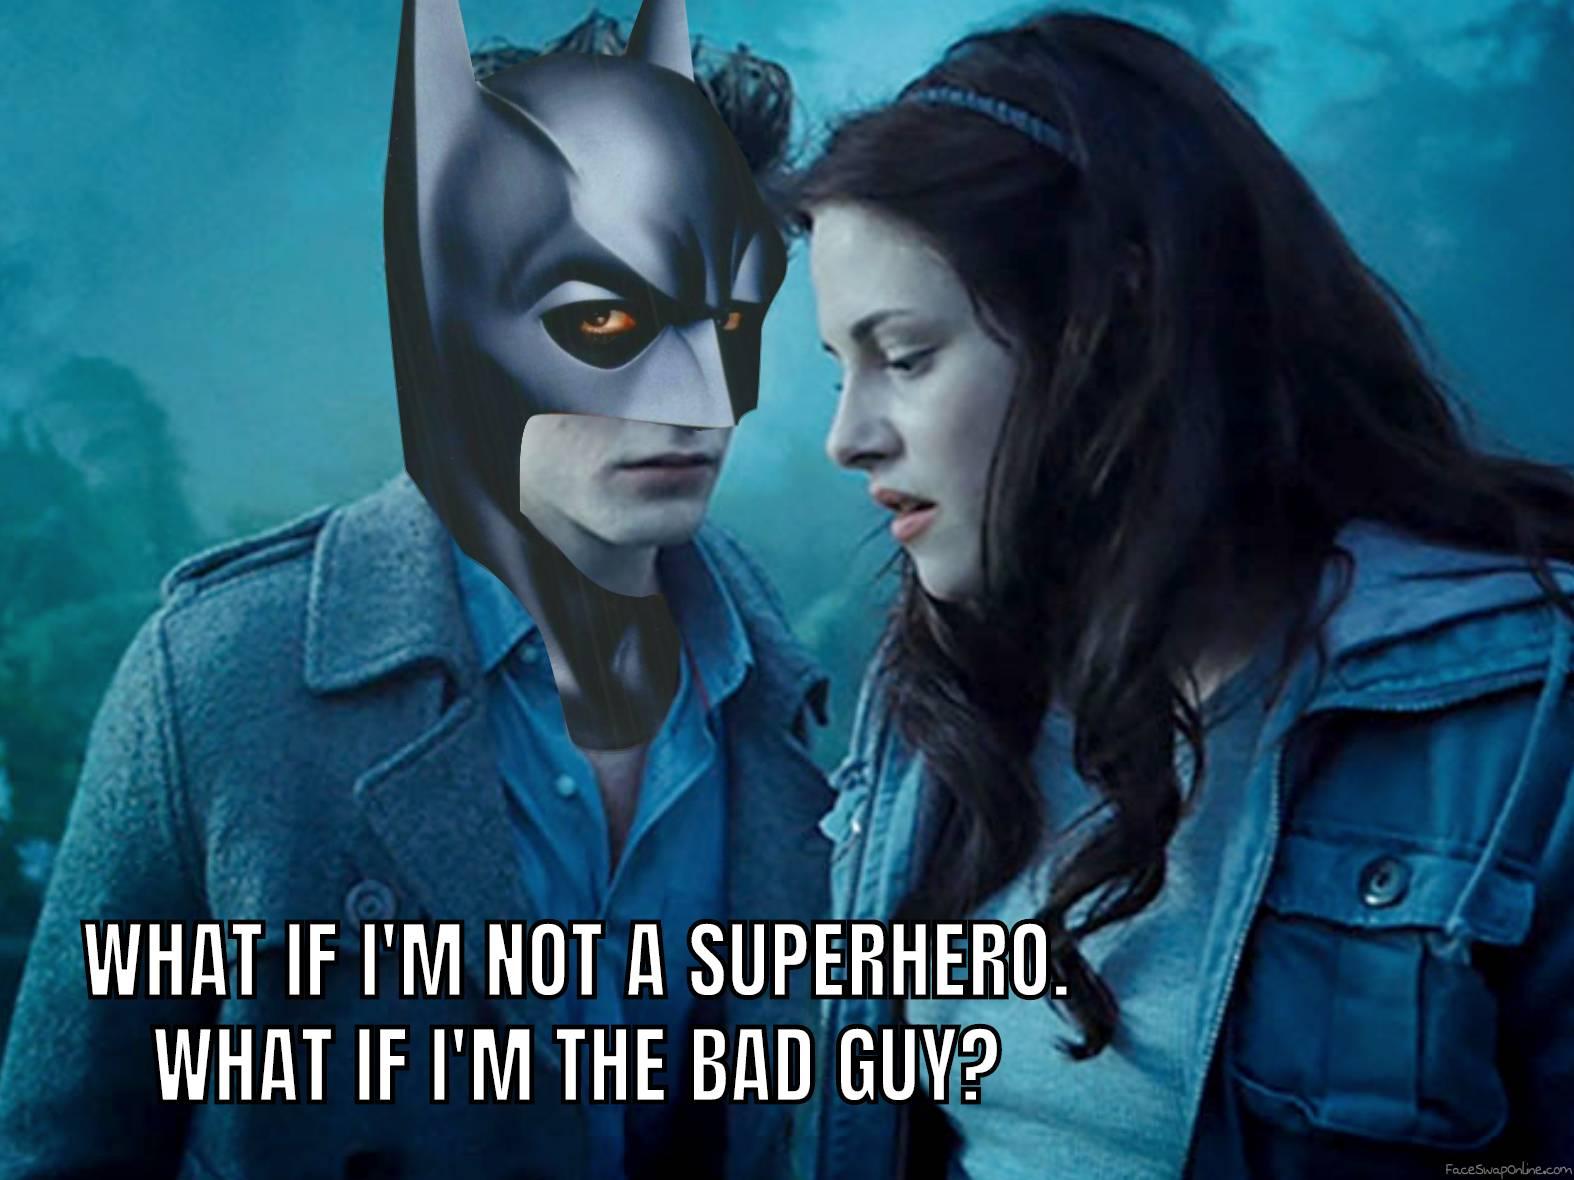 Robert Pattinson Batman vs Twilight